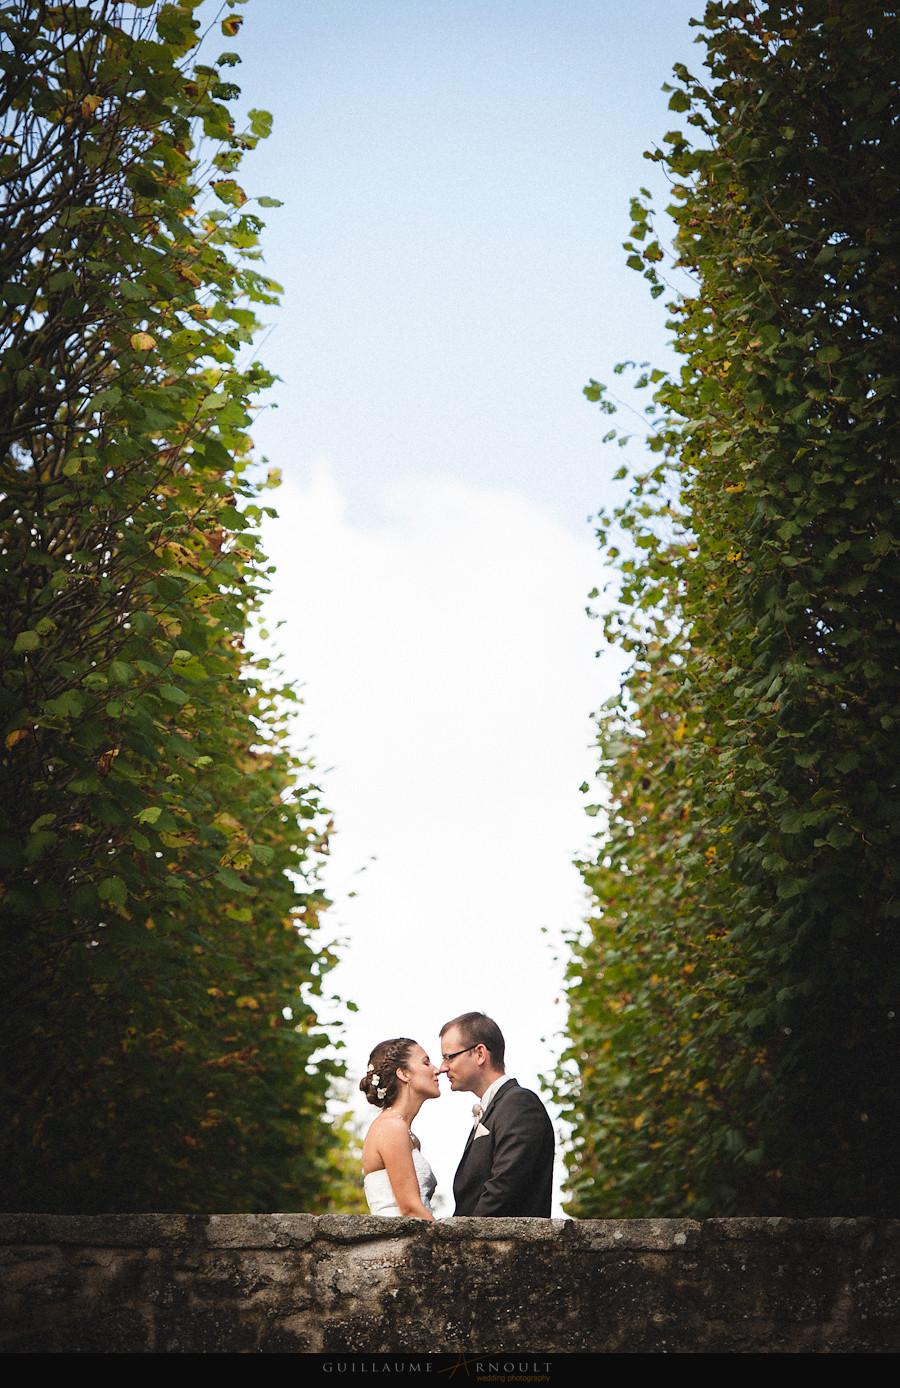 day after c line fran ois guillaume arnoult wedding photographer photographe de mariage. Black Bedroom Furniture Sets. Home Design Ideas